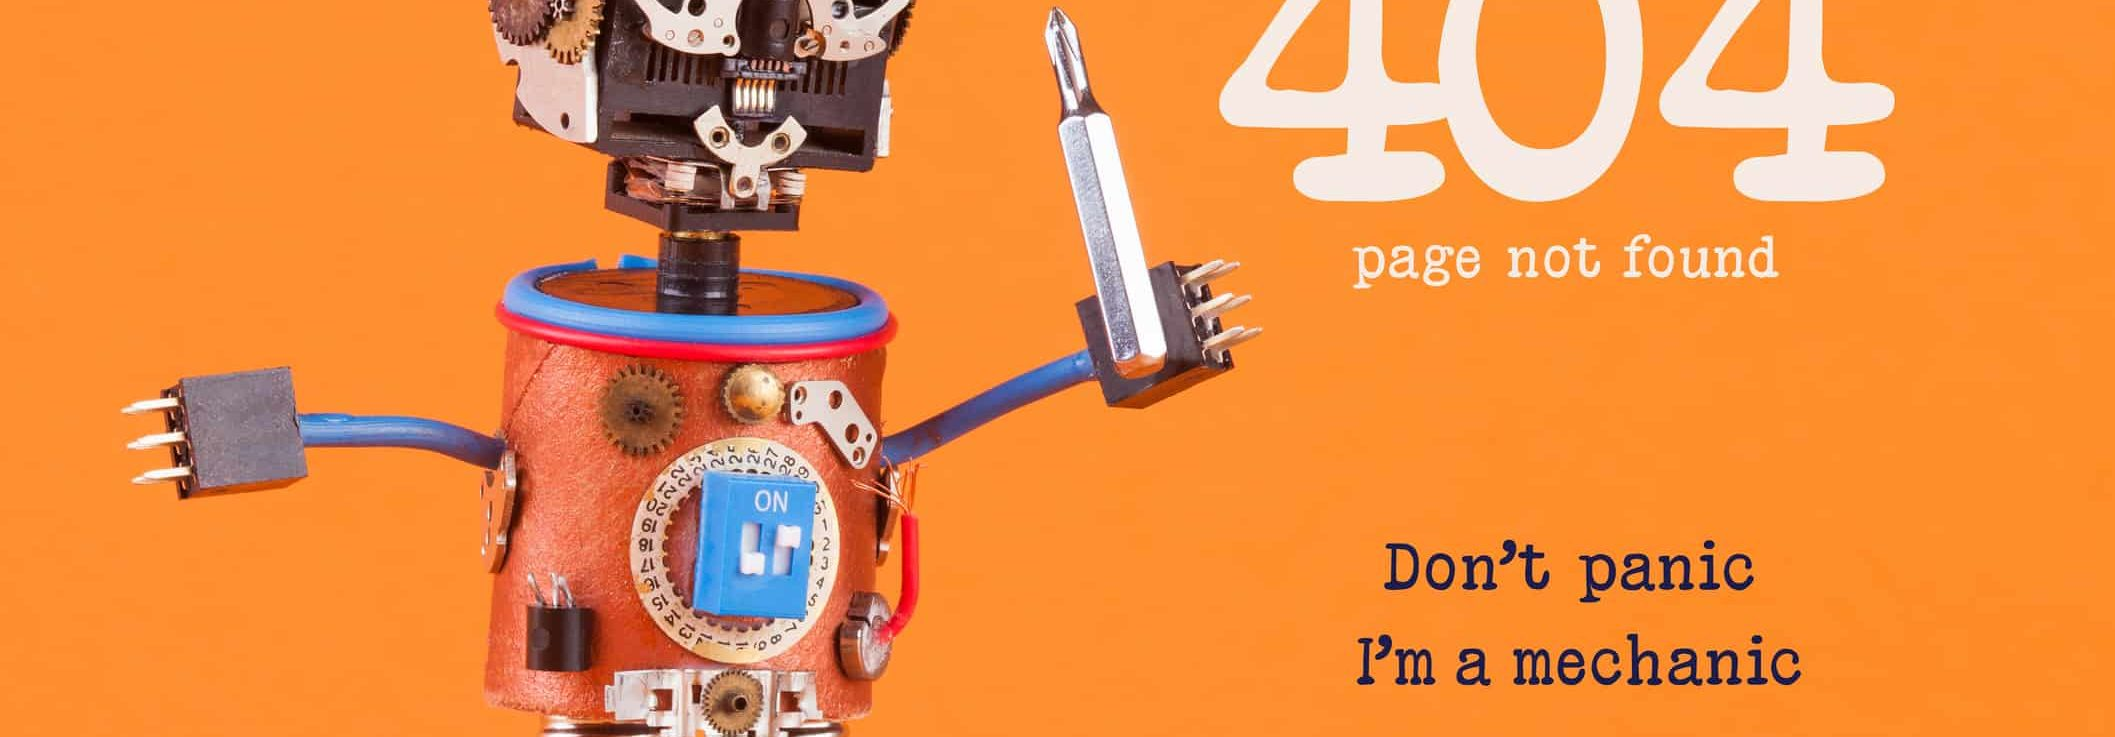 404 error aprwebdesign mechanic